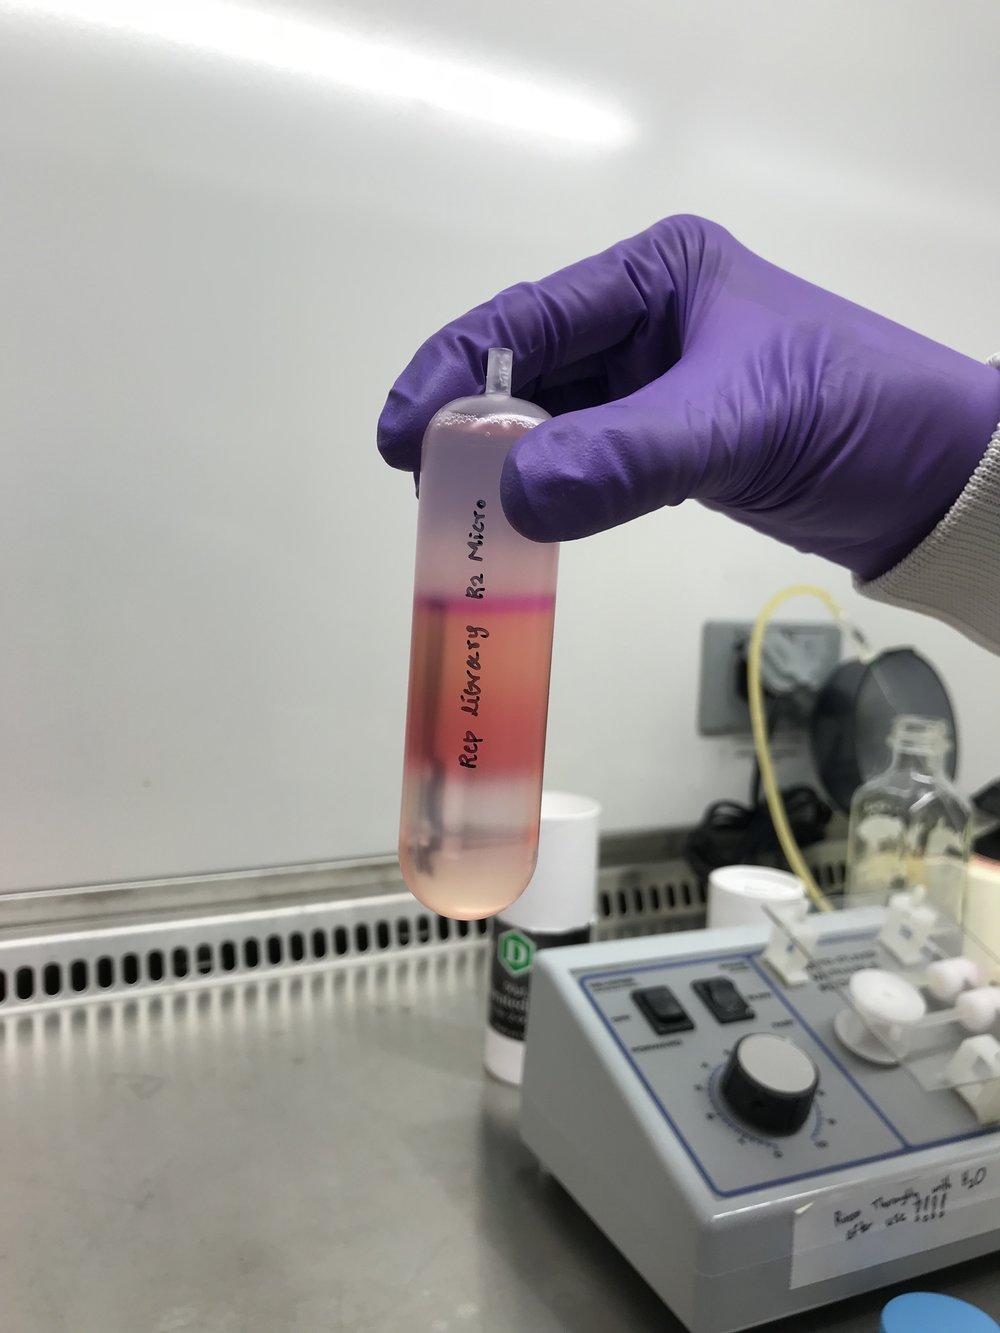 iodixanol gradient pre-centrifugation.jpg